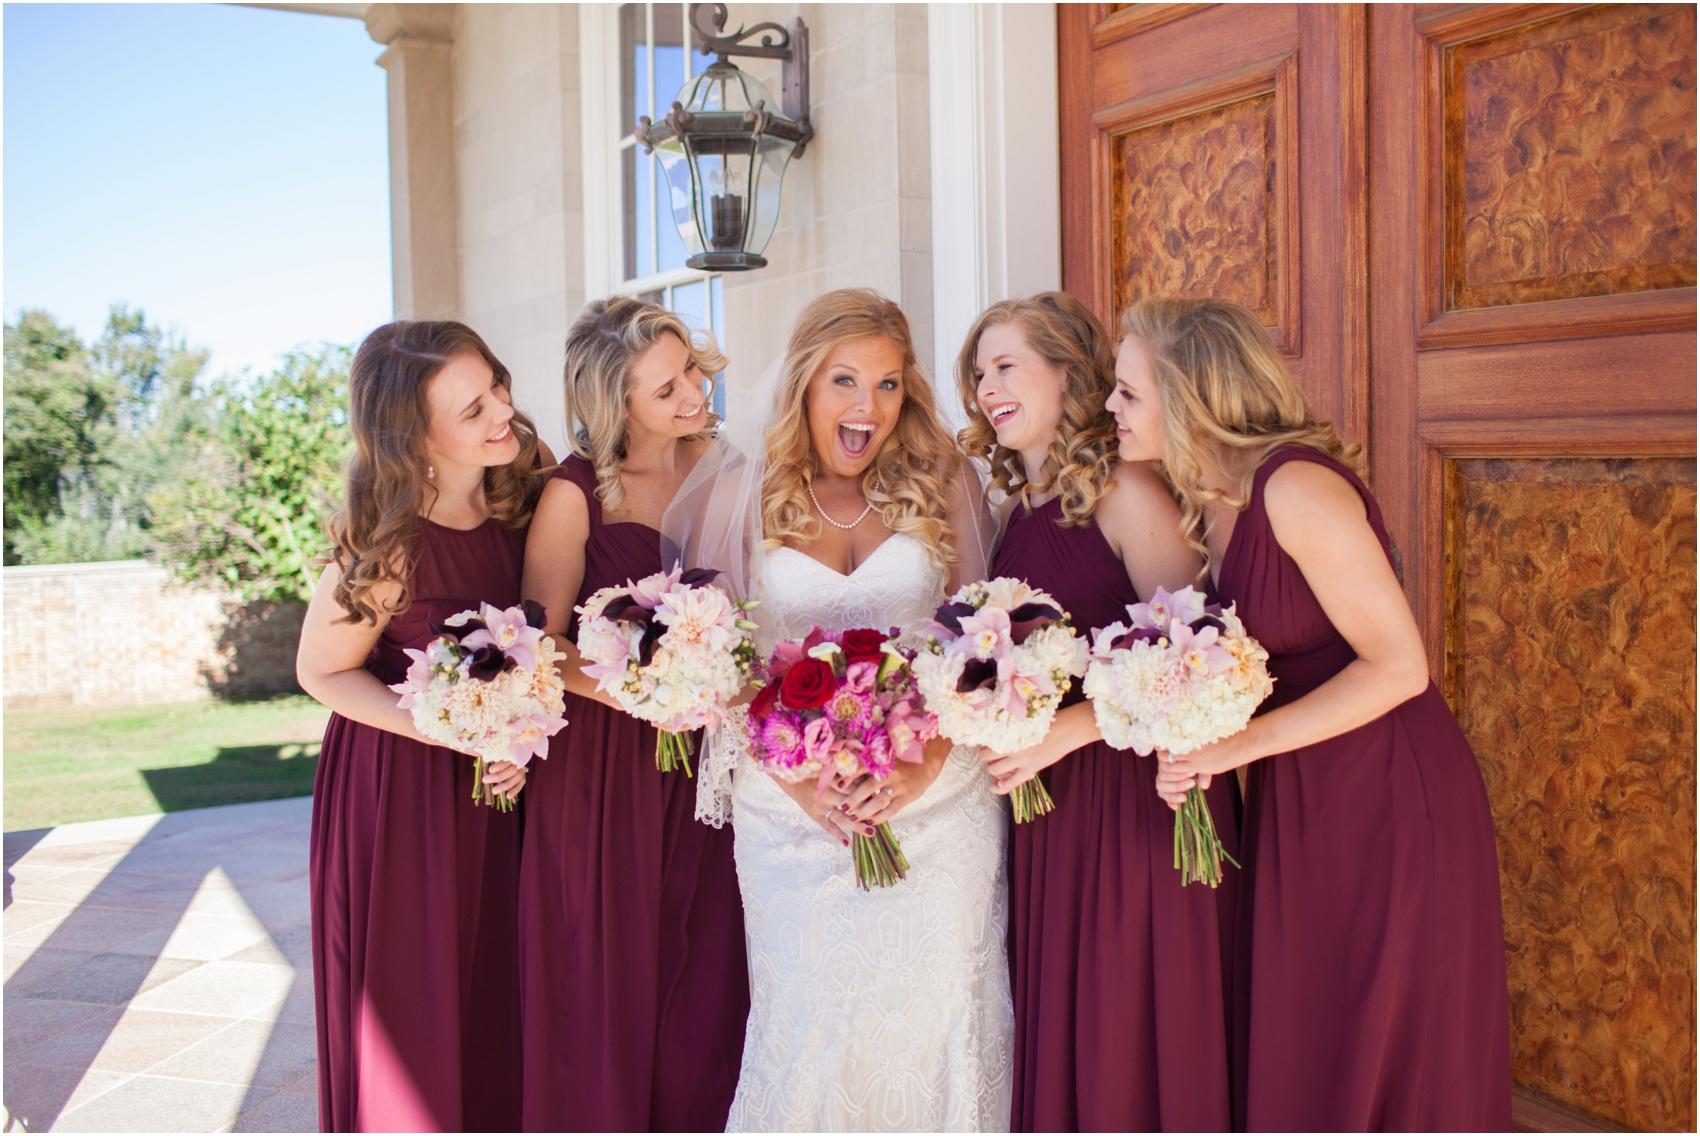 Grace-Estate-Winery-Fall-Virginia-Wedding-6211.jpg